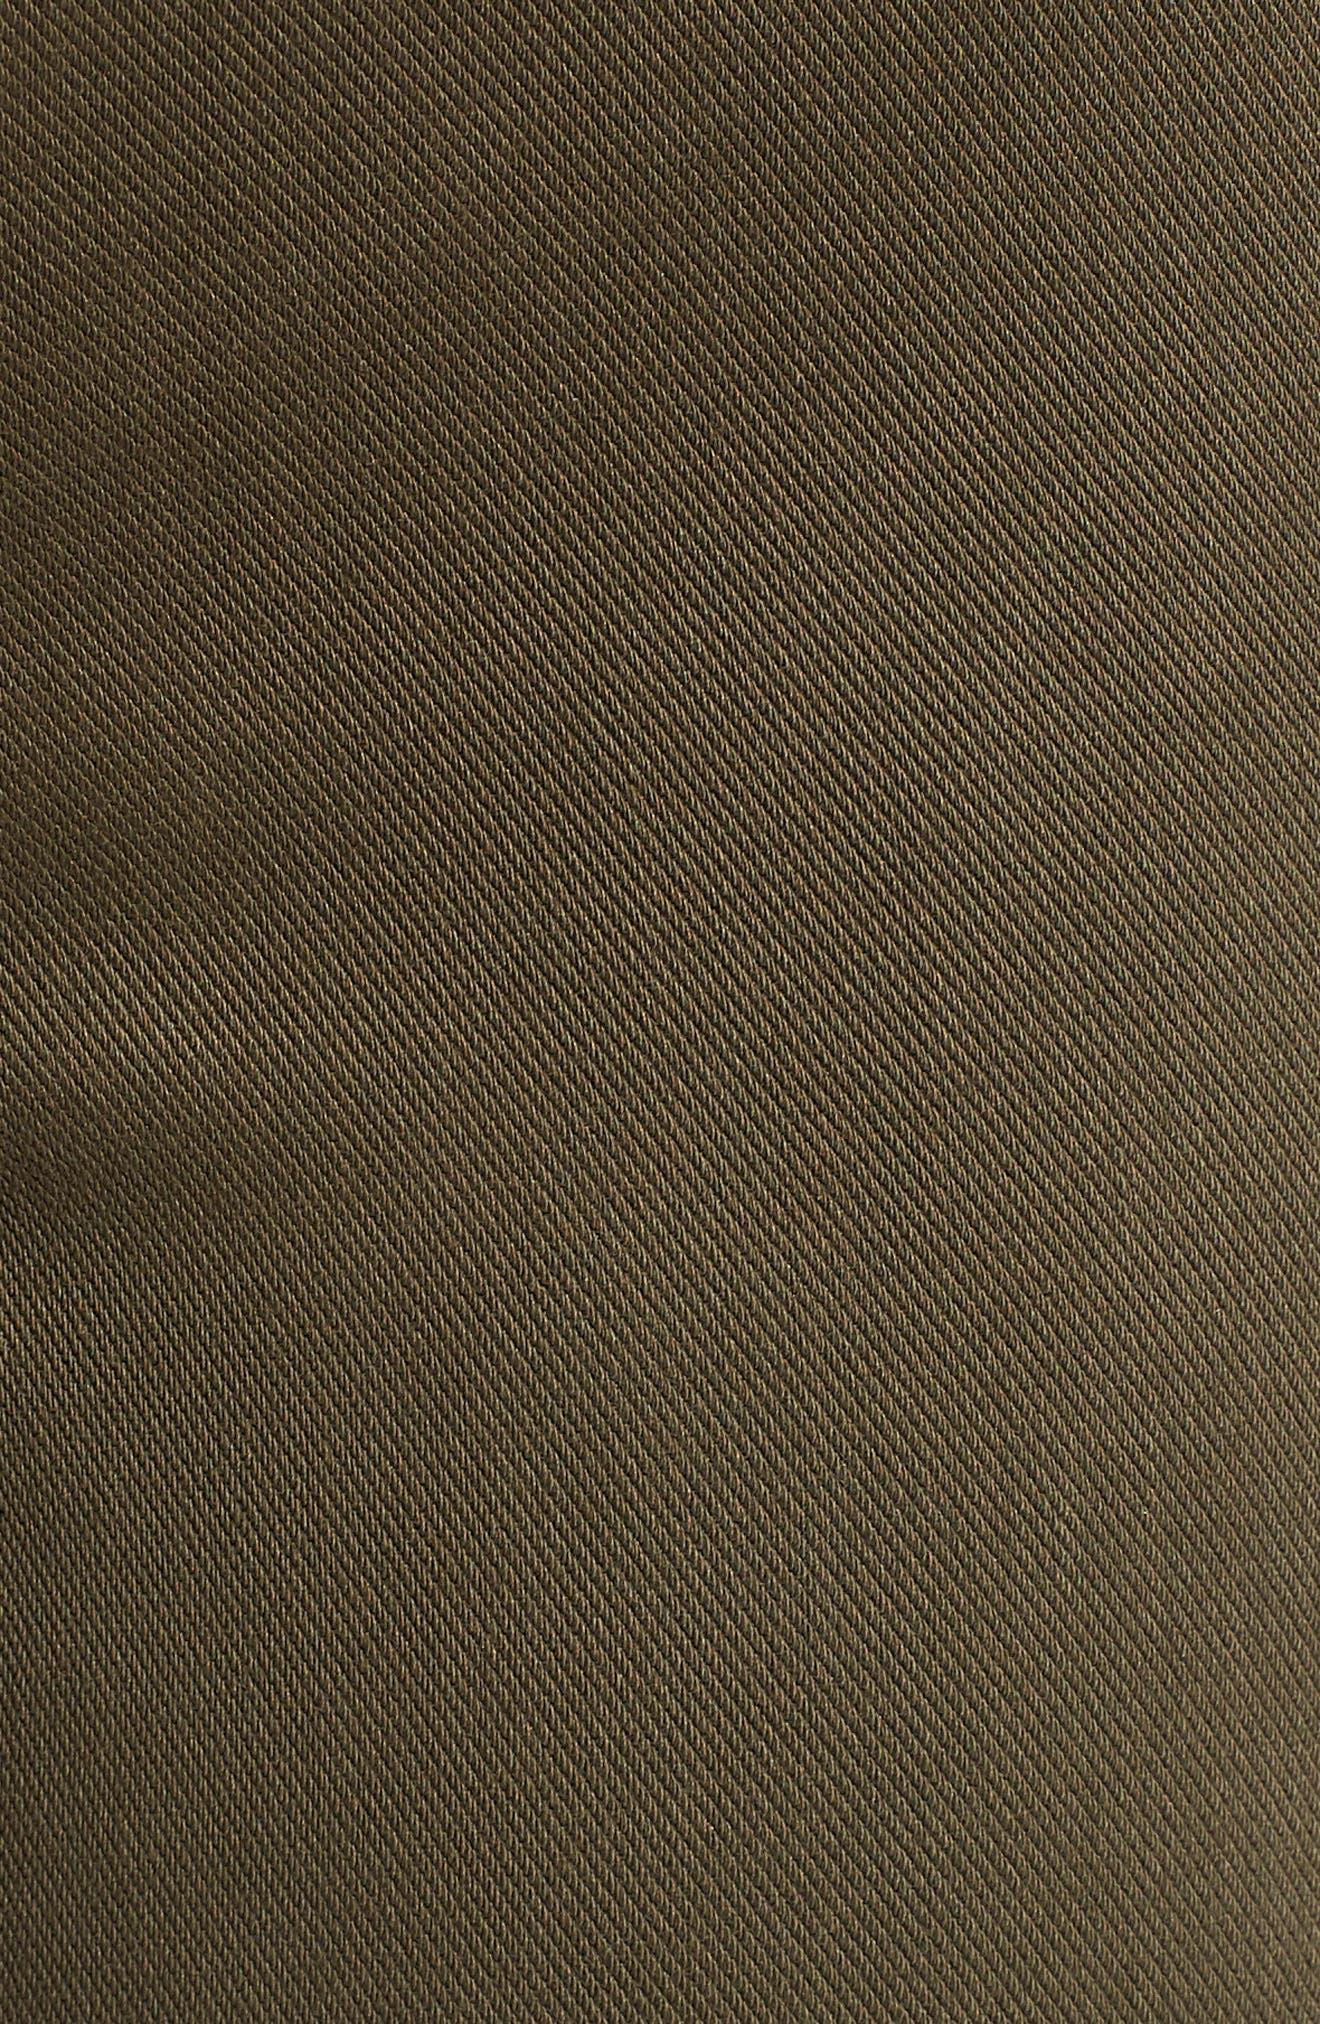 Jean-ish Leggings,                             Alternate thumbnail 5, color,                             DARK OLIVE